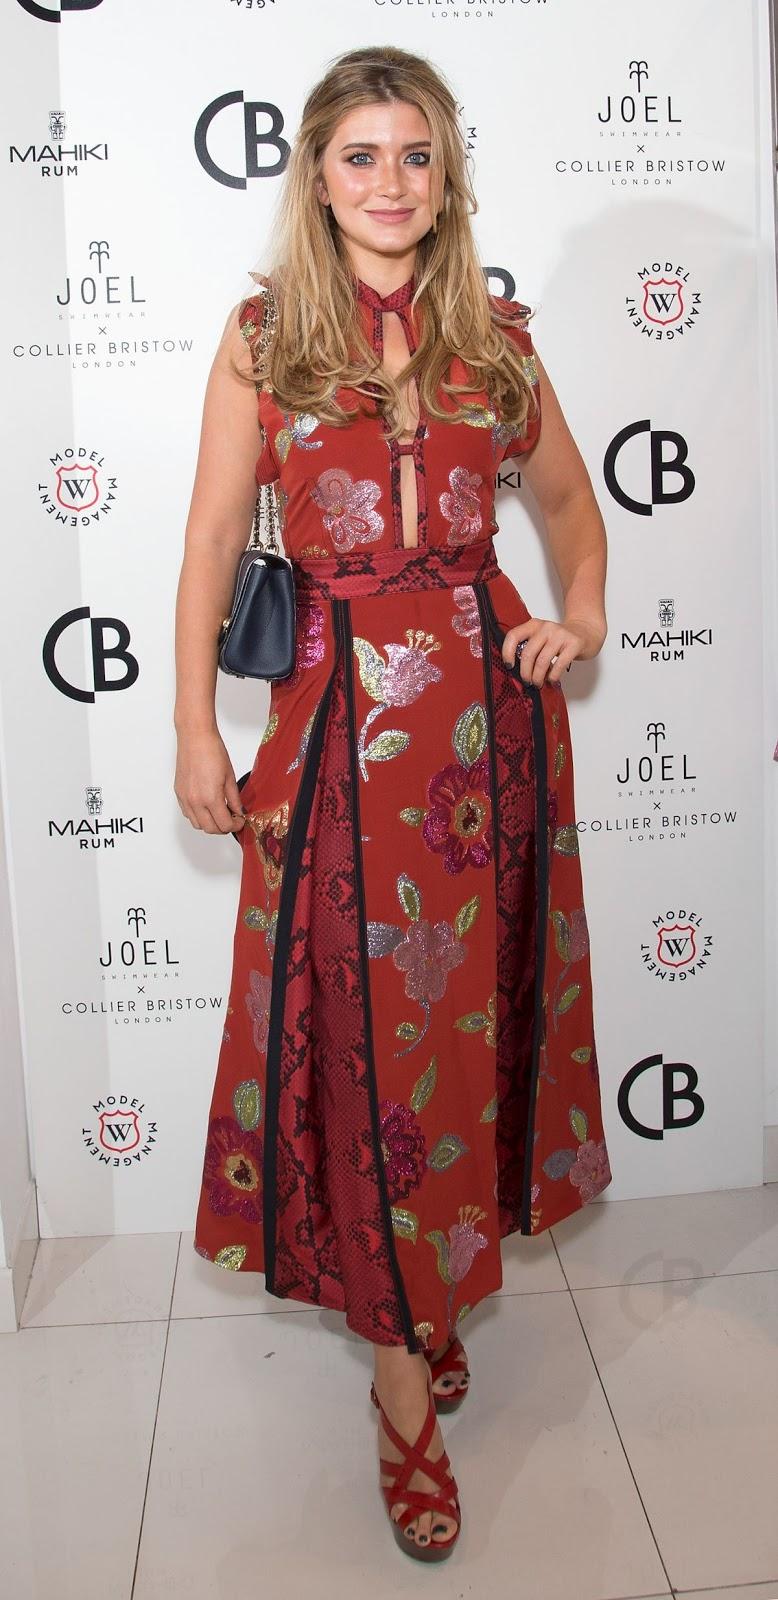 Lauren Hutton at Joel Swimwear X Collier Bristow Press Launch in London